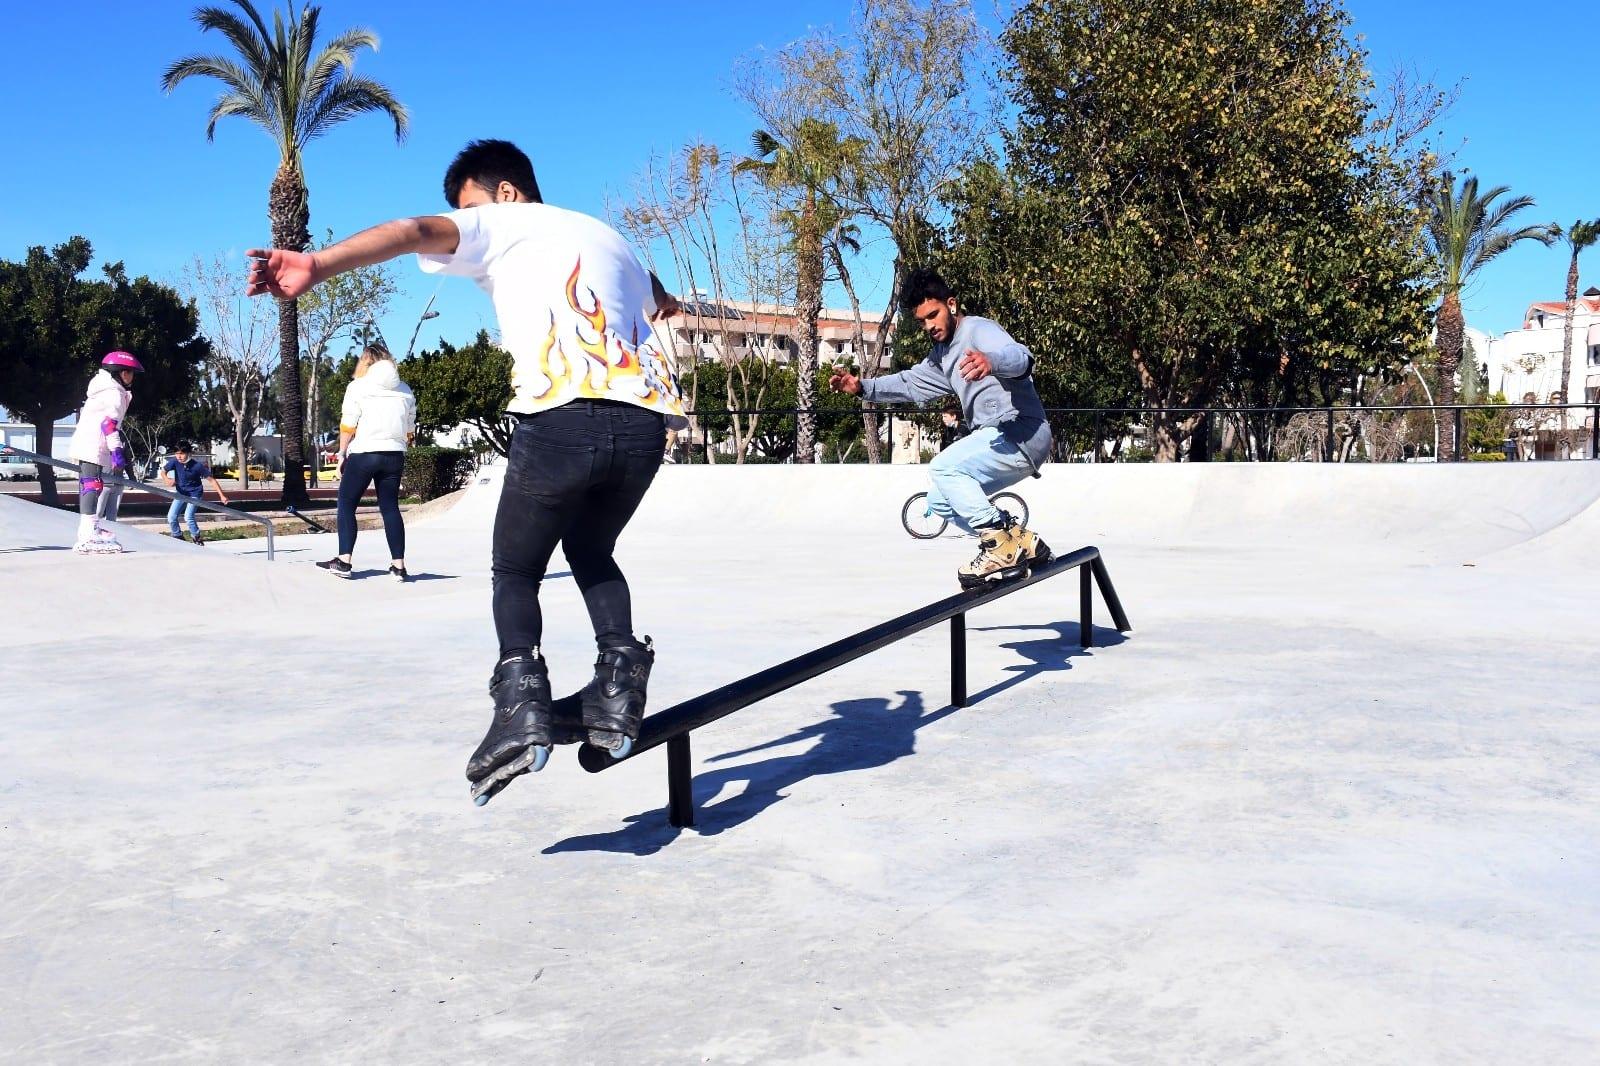 skate parka genclerden yogun ilgi 1 JpHHedrt